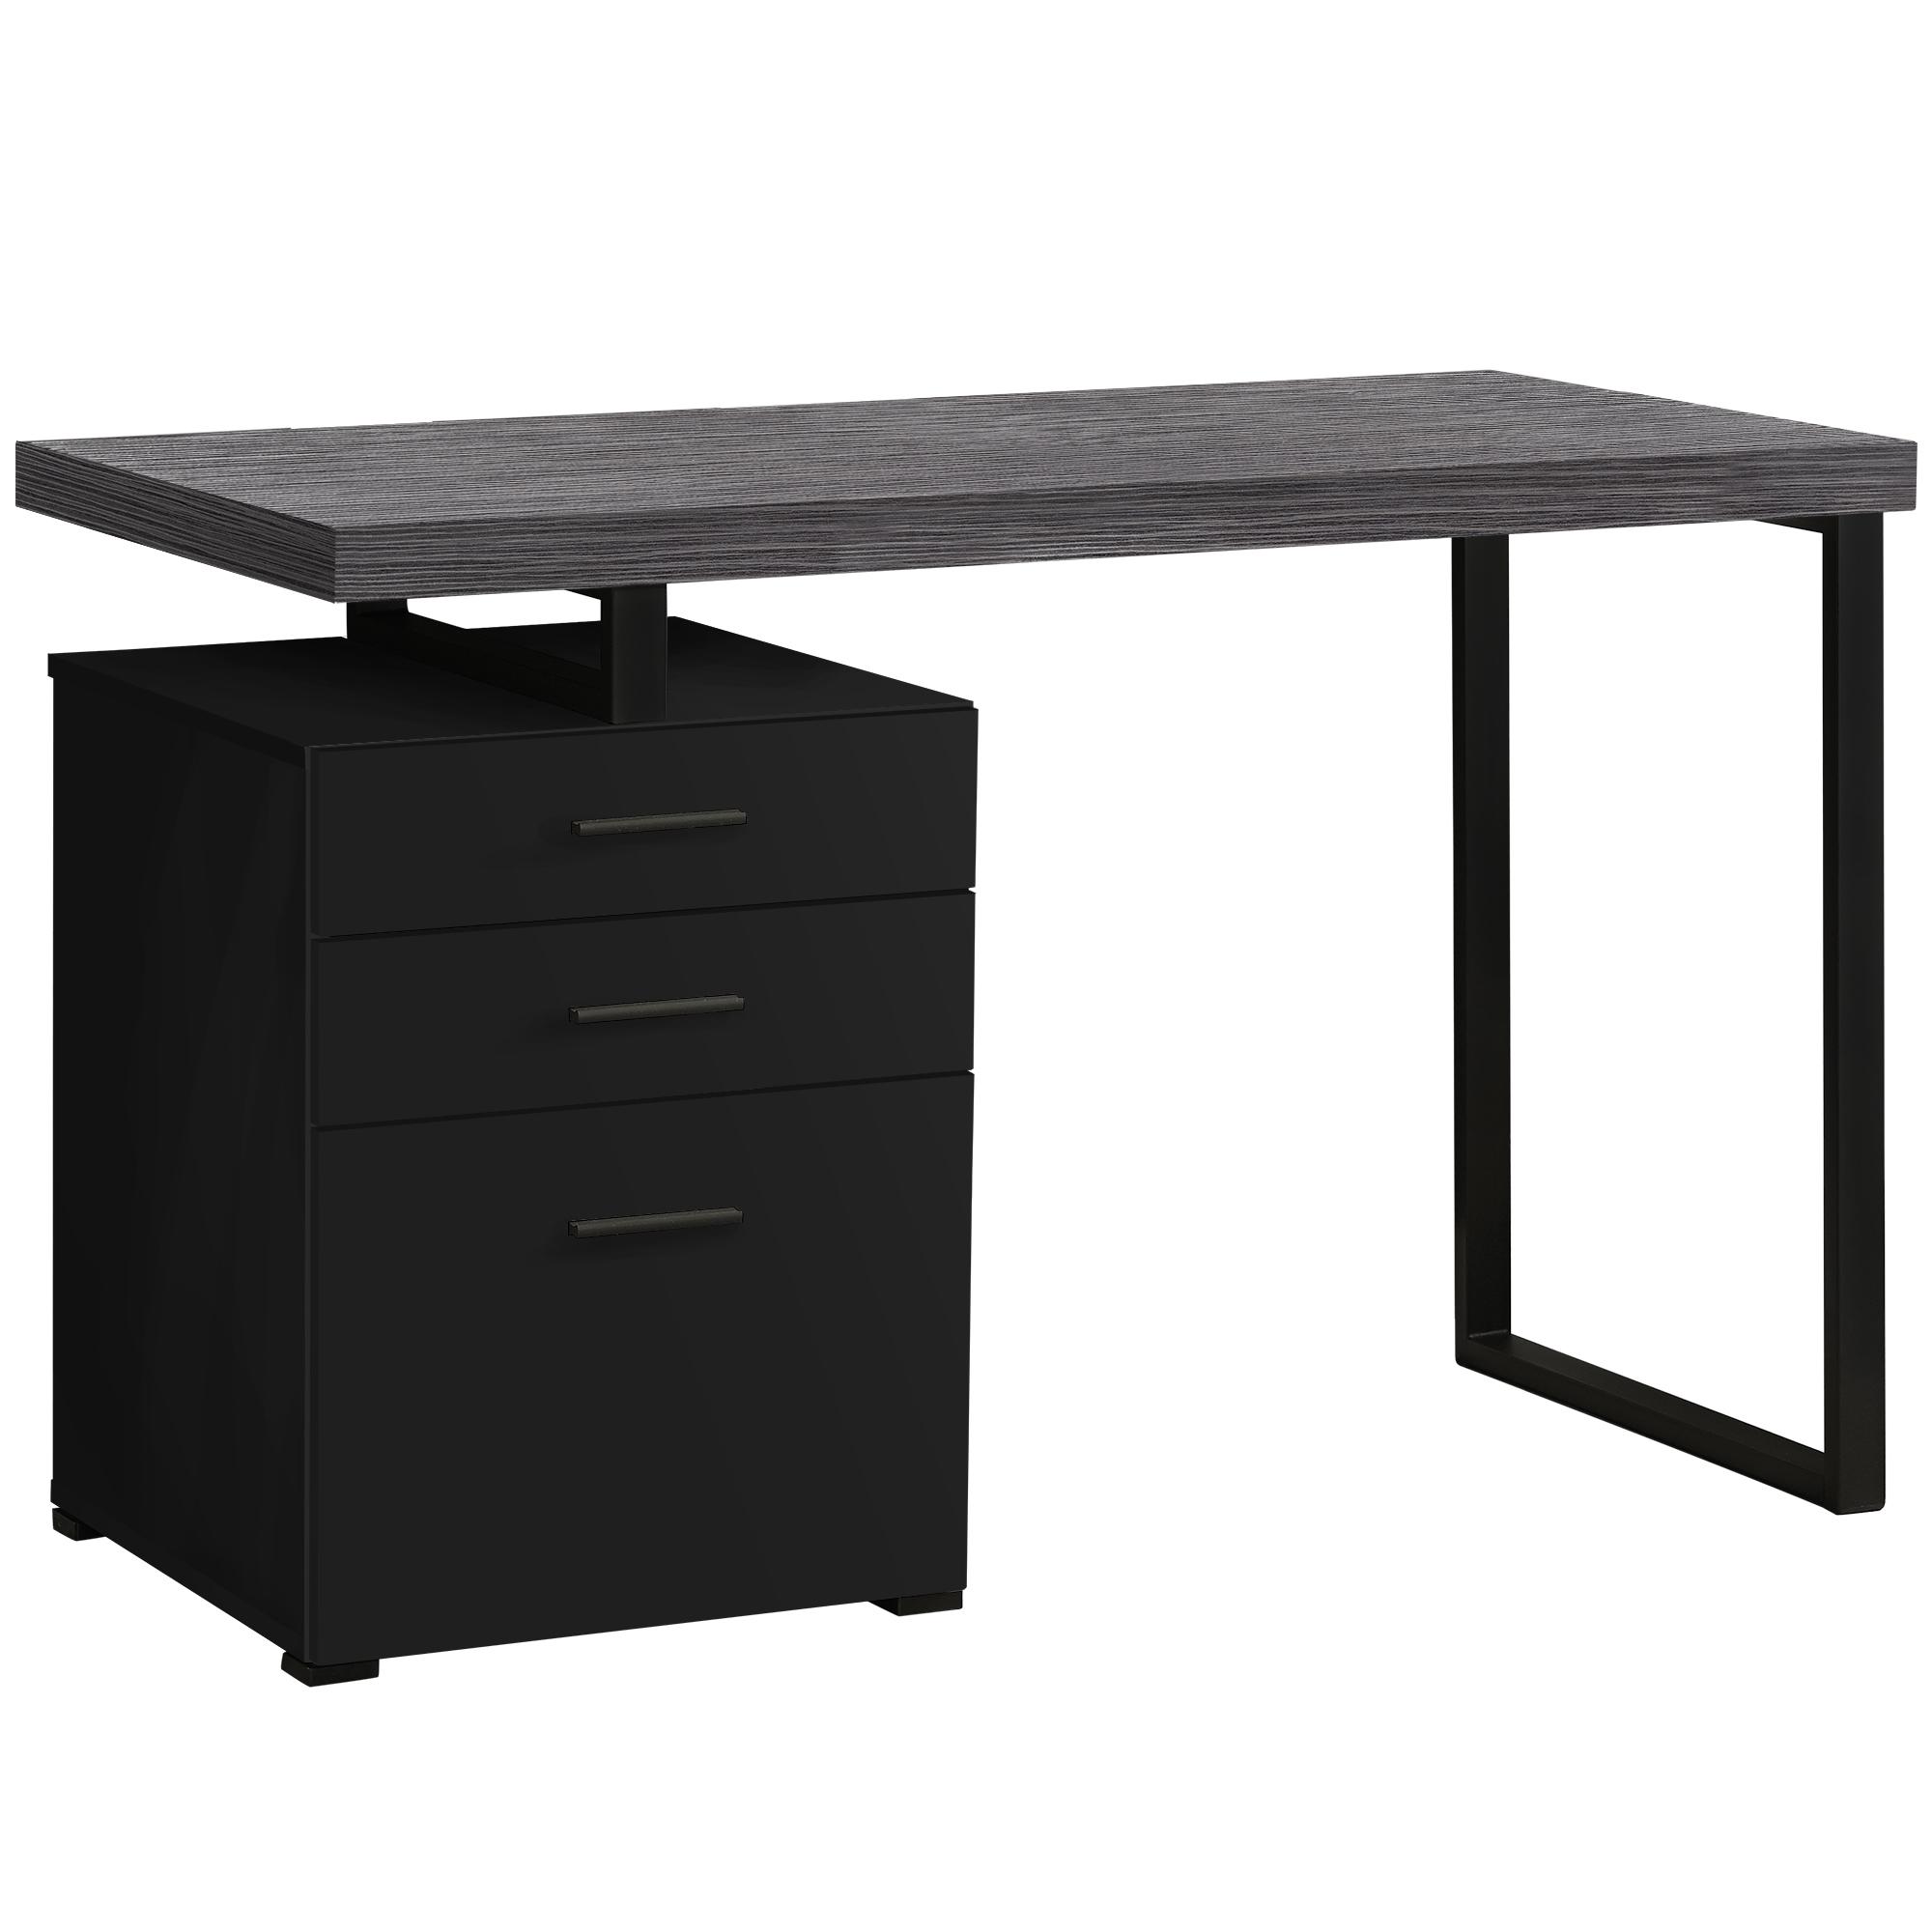 "23.75"" x 47.25"" x 30"" Black Grey Particle Board Hollow Core Metal  Computer Desk"